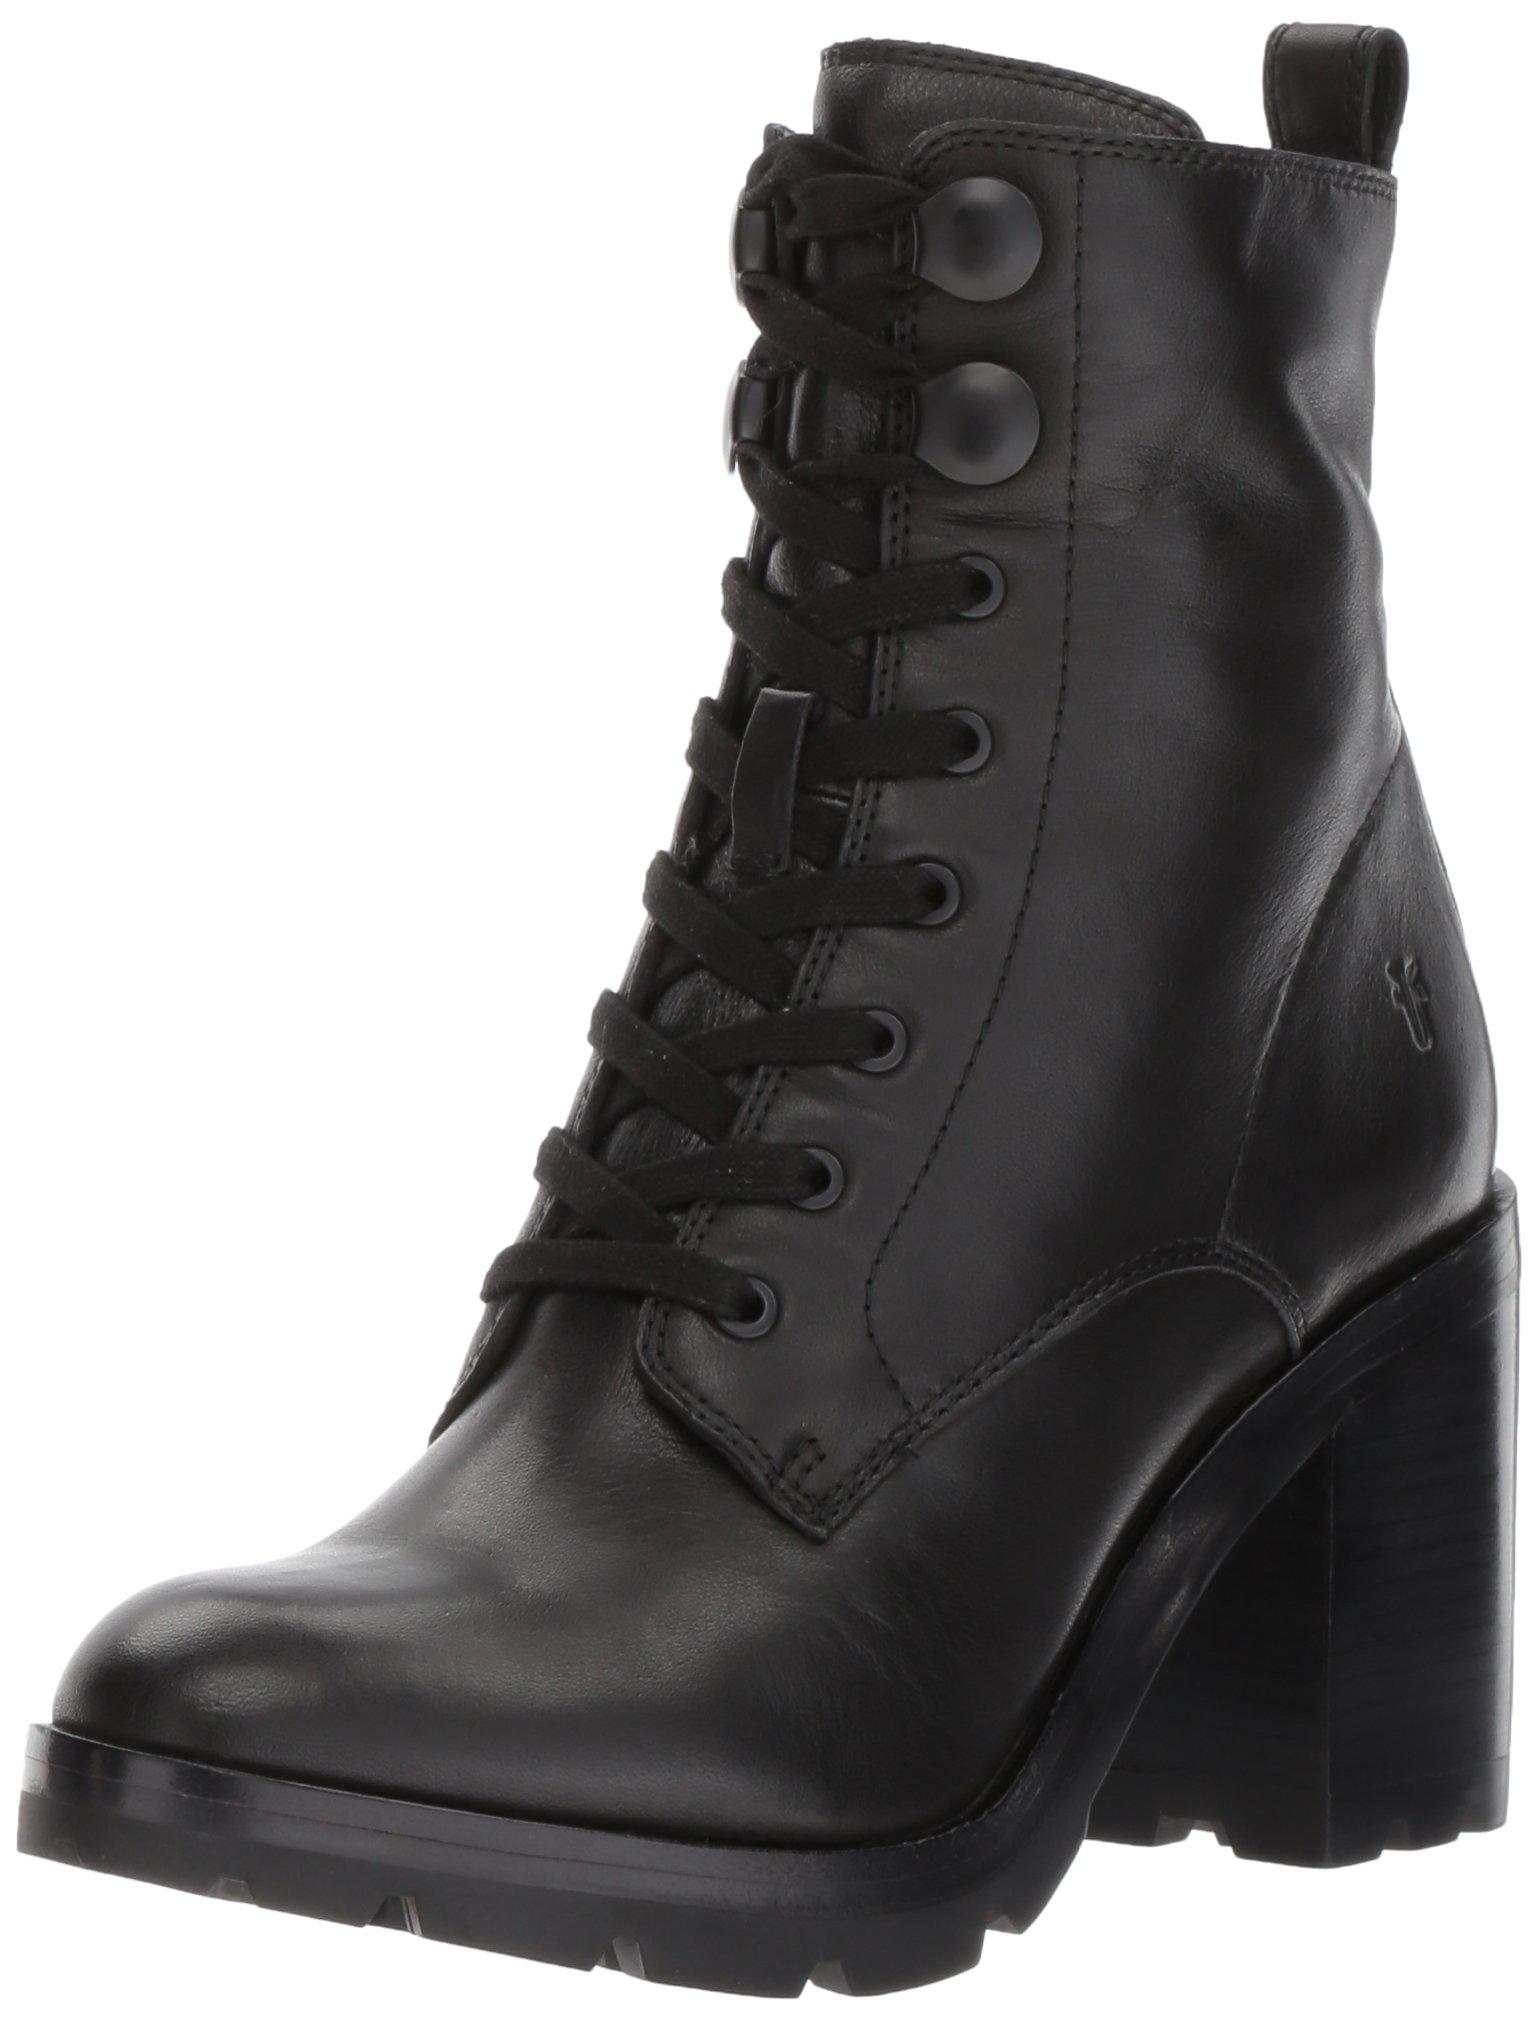 FRYE Women's Myra Lug Combat Boot, Black Polished Soft Full Grain, 6 M US